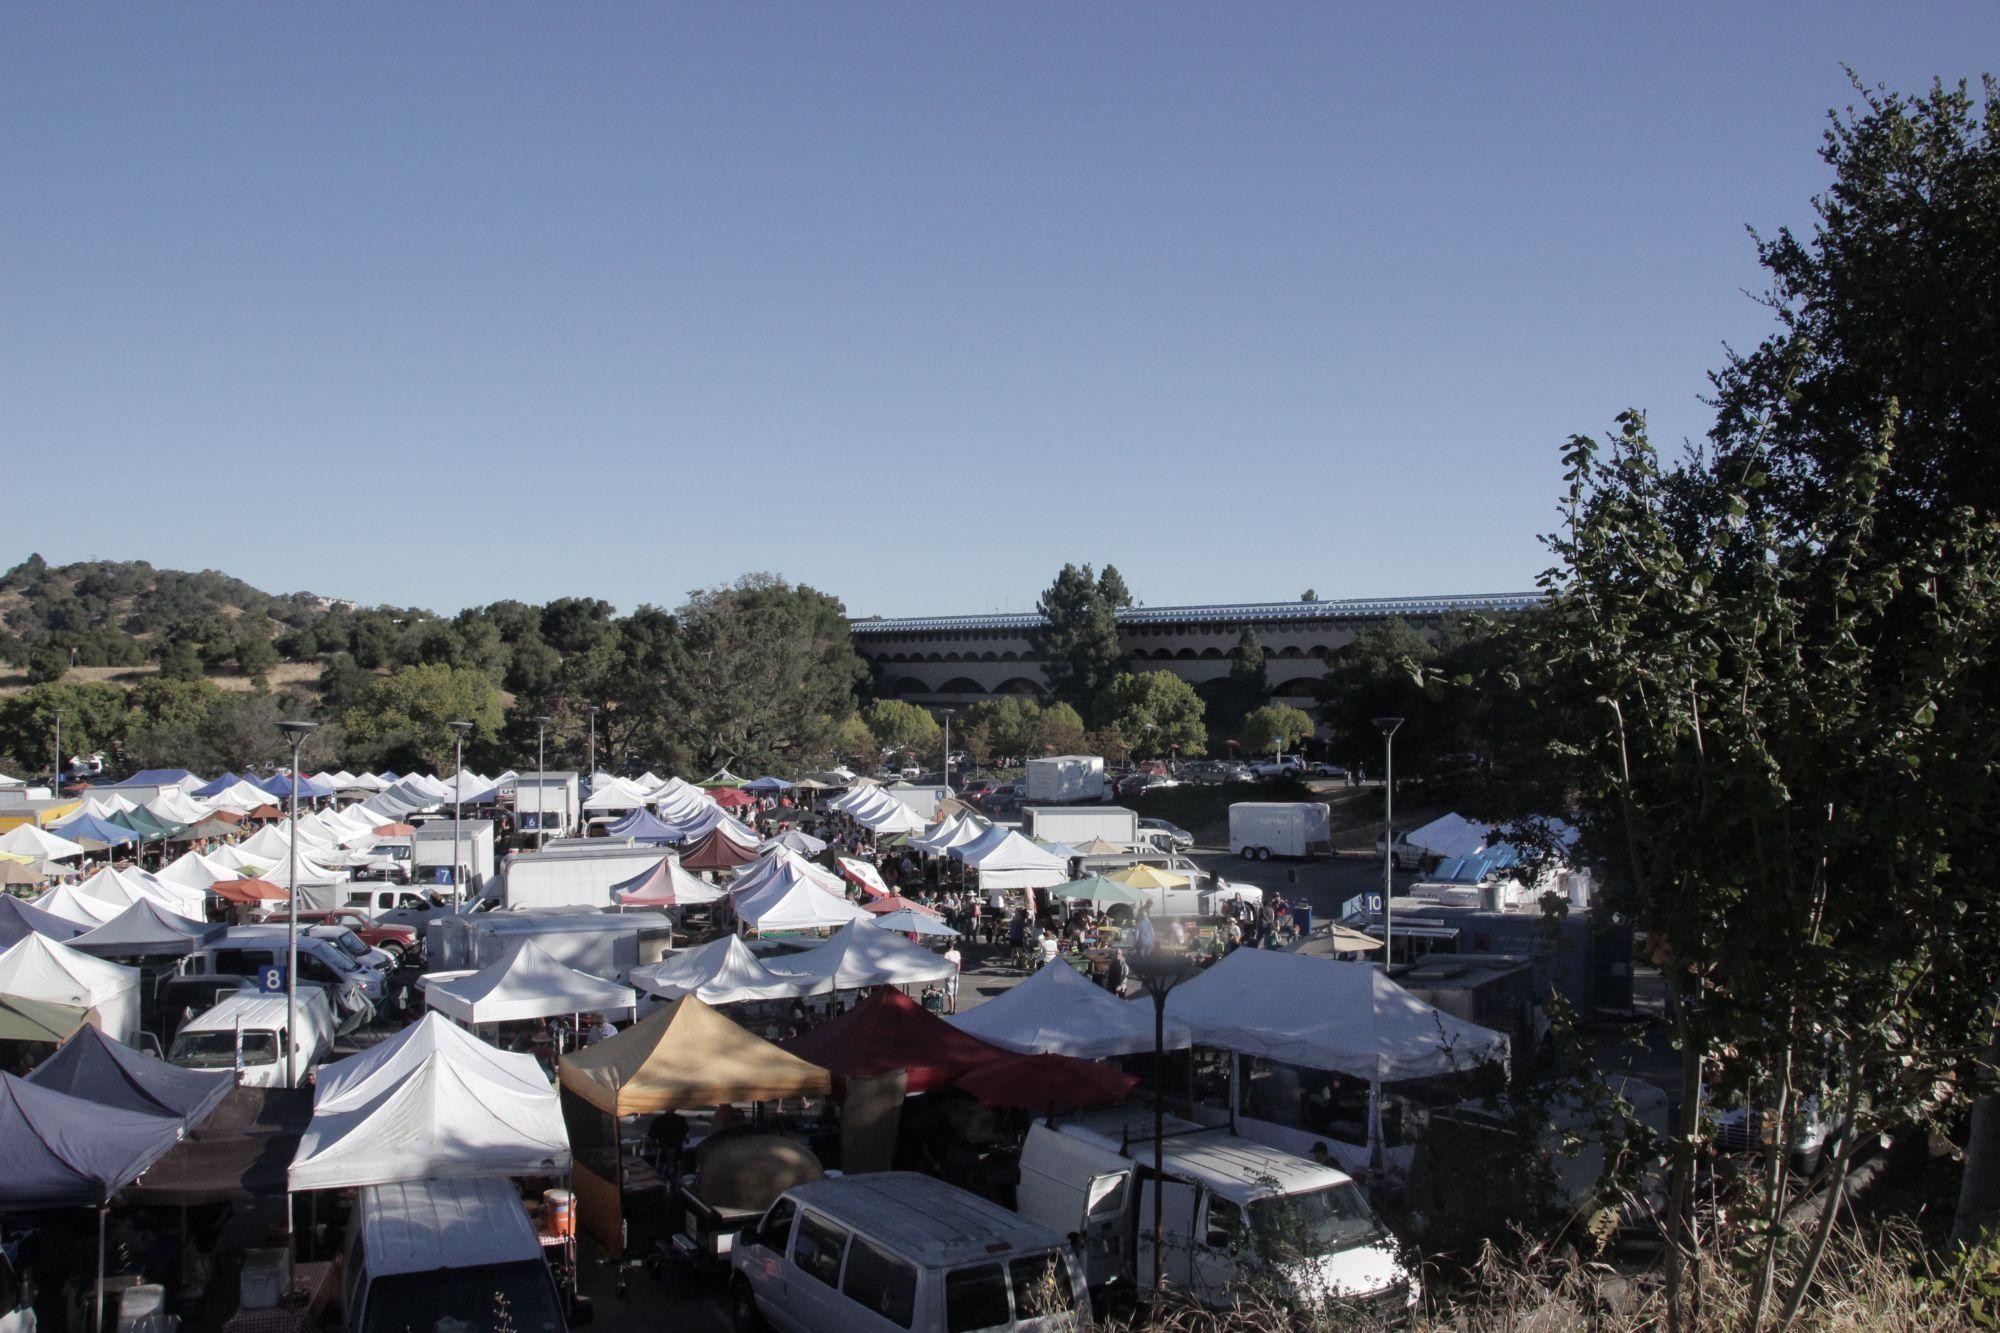 The San Rafael farmers market on a busy Sunday morning.